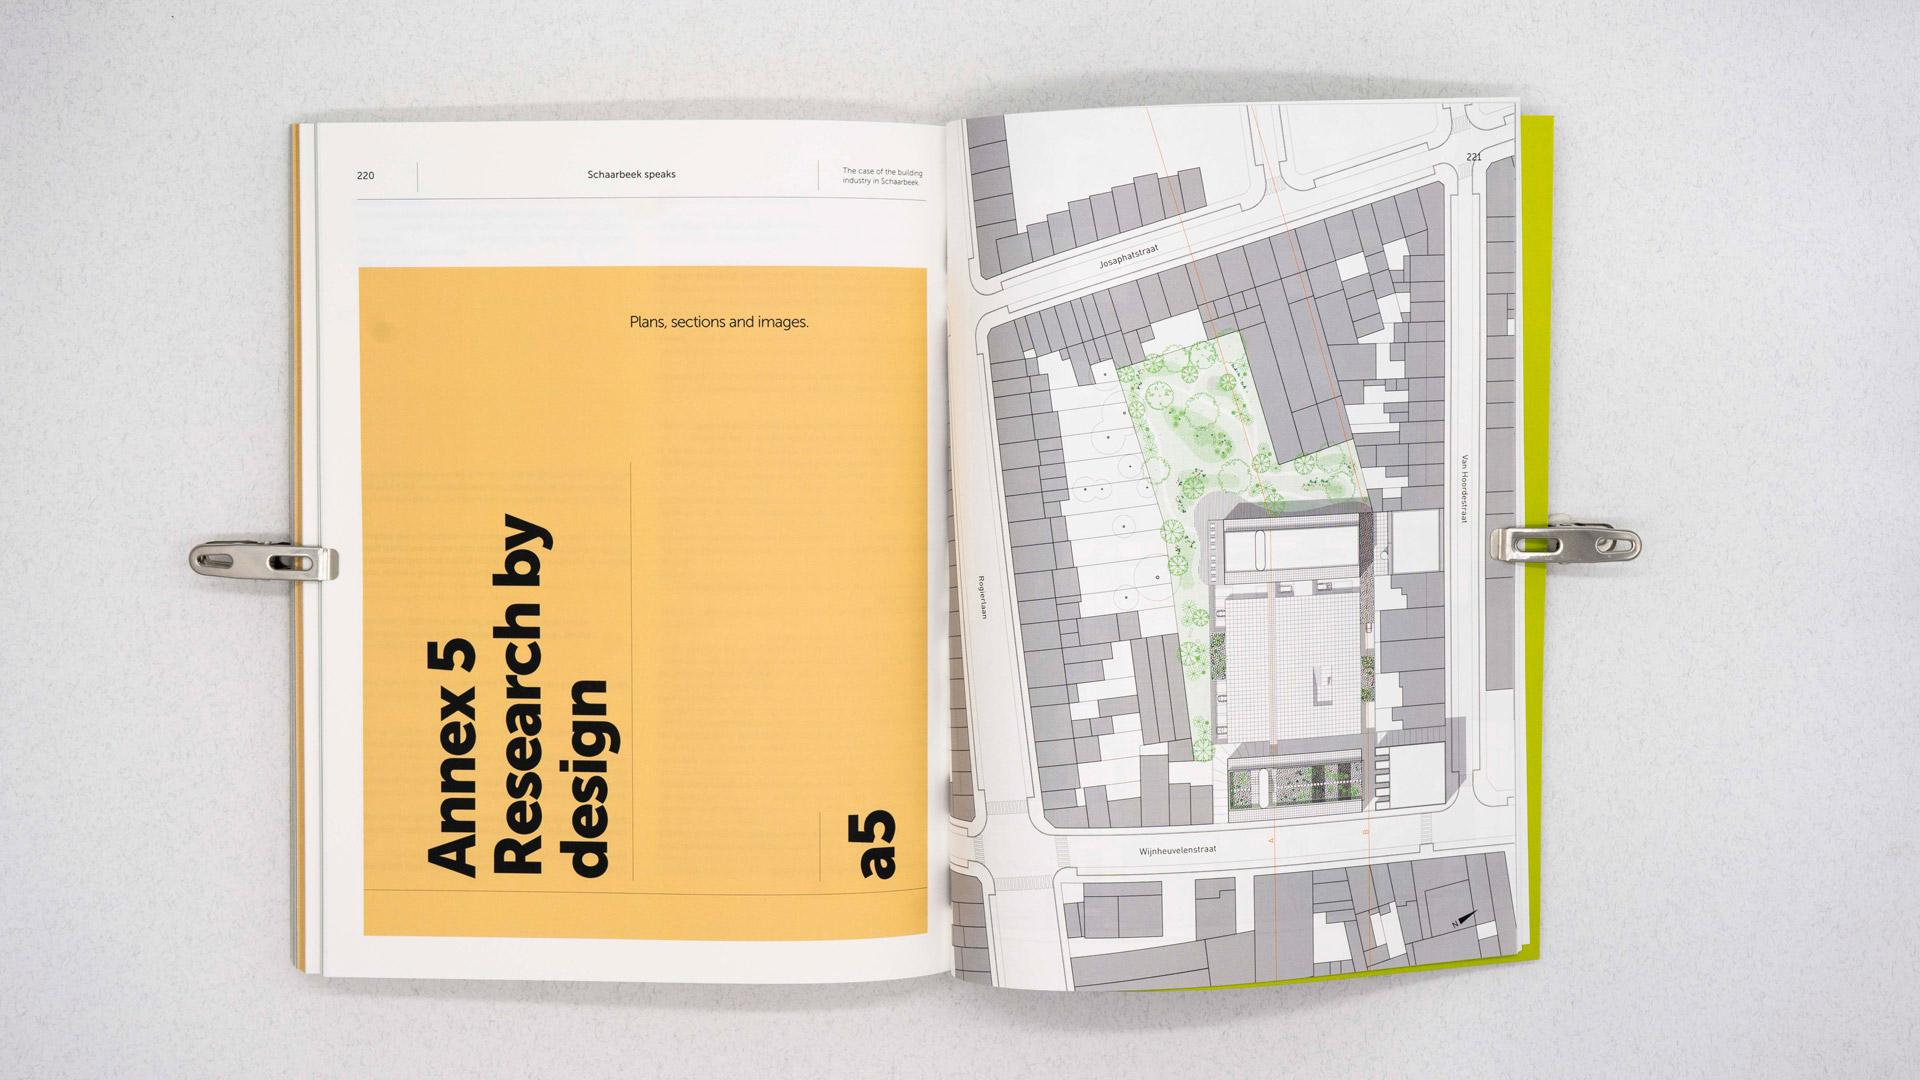 schaarbeek_speak_photo5_printed_book